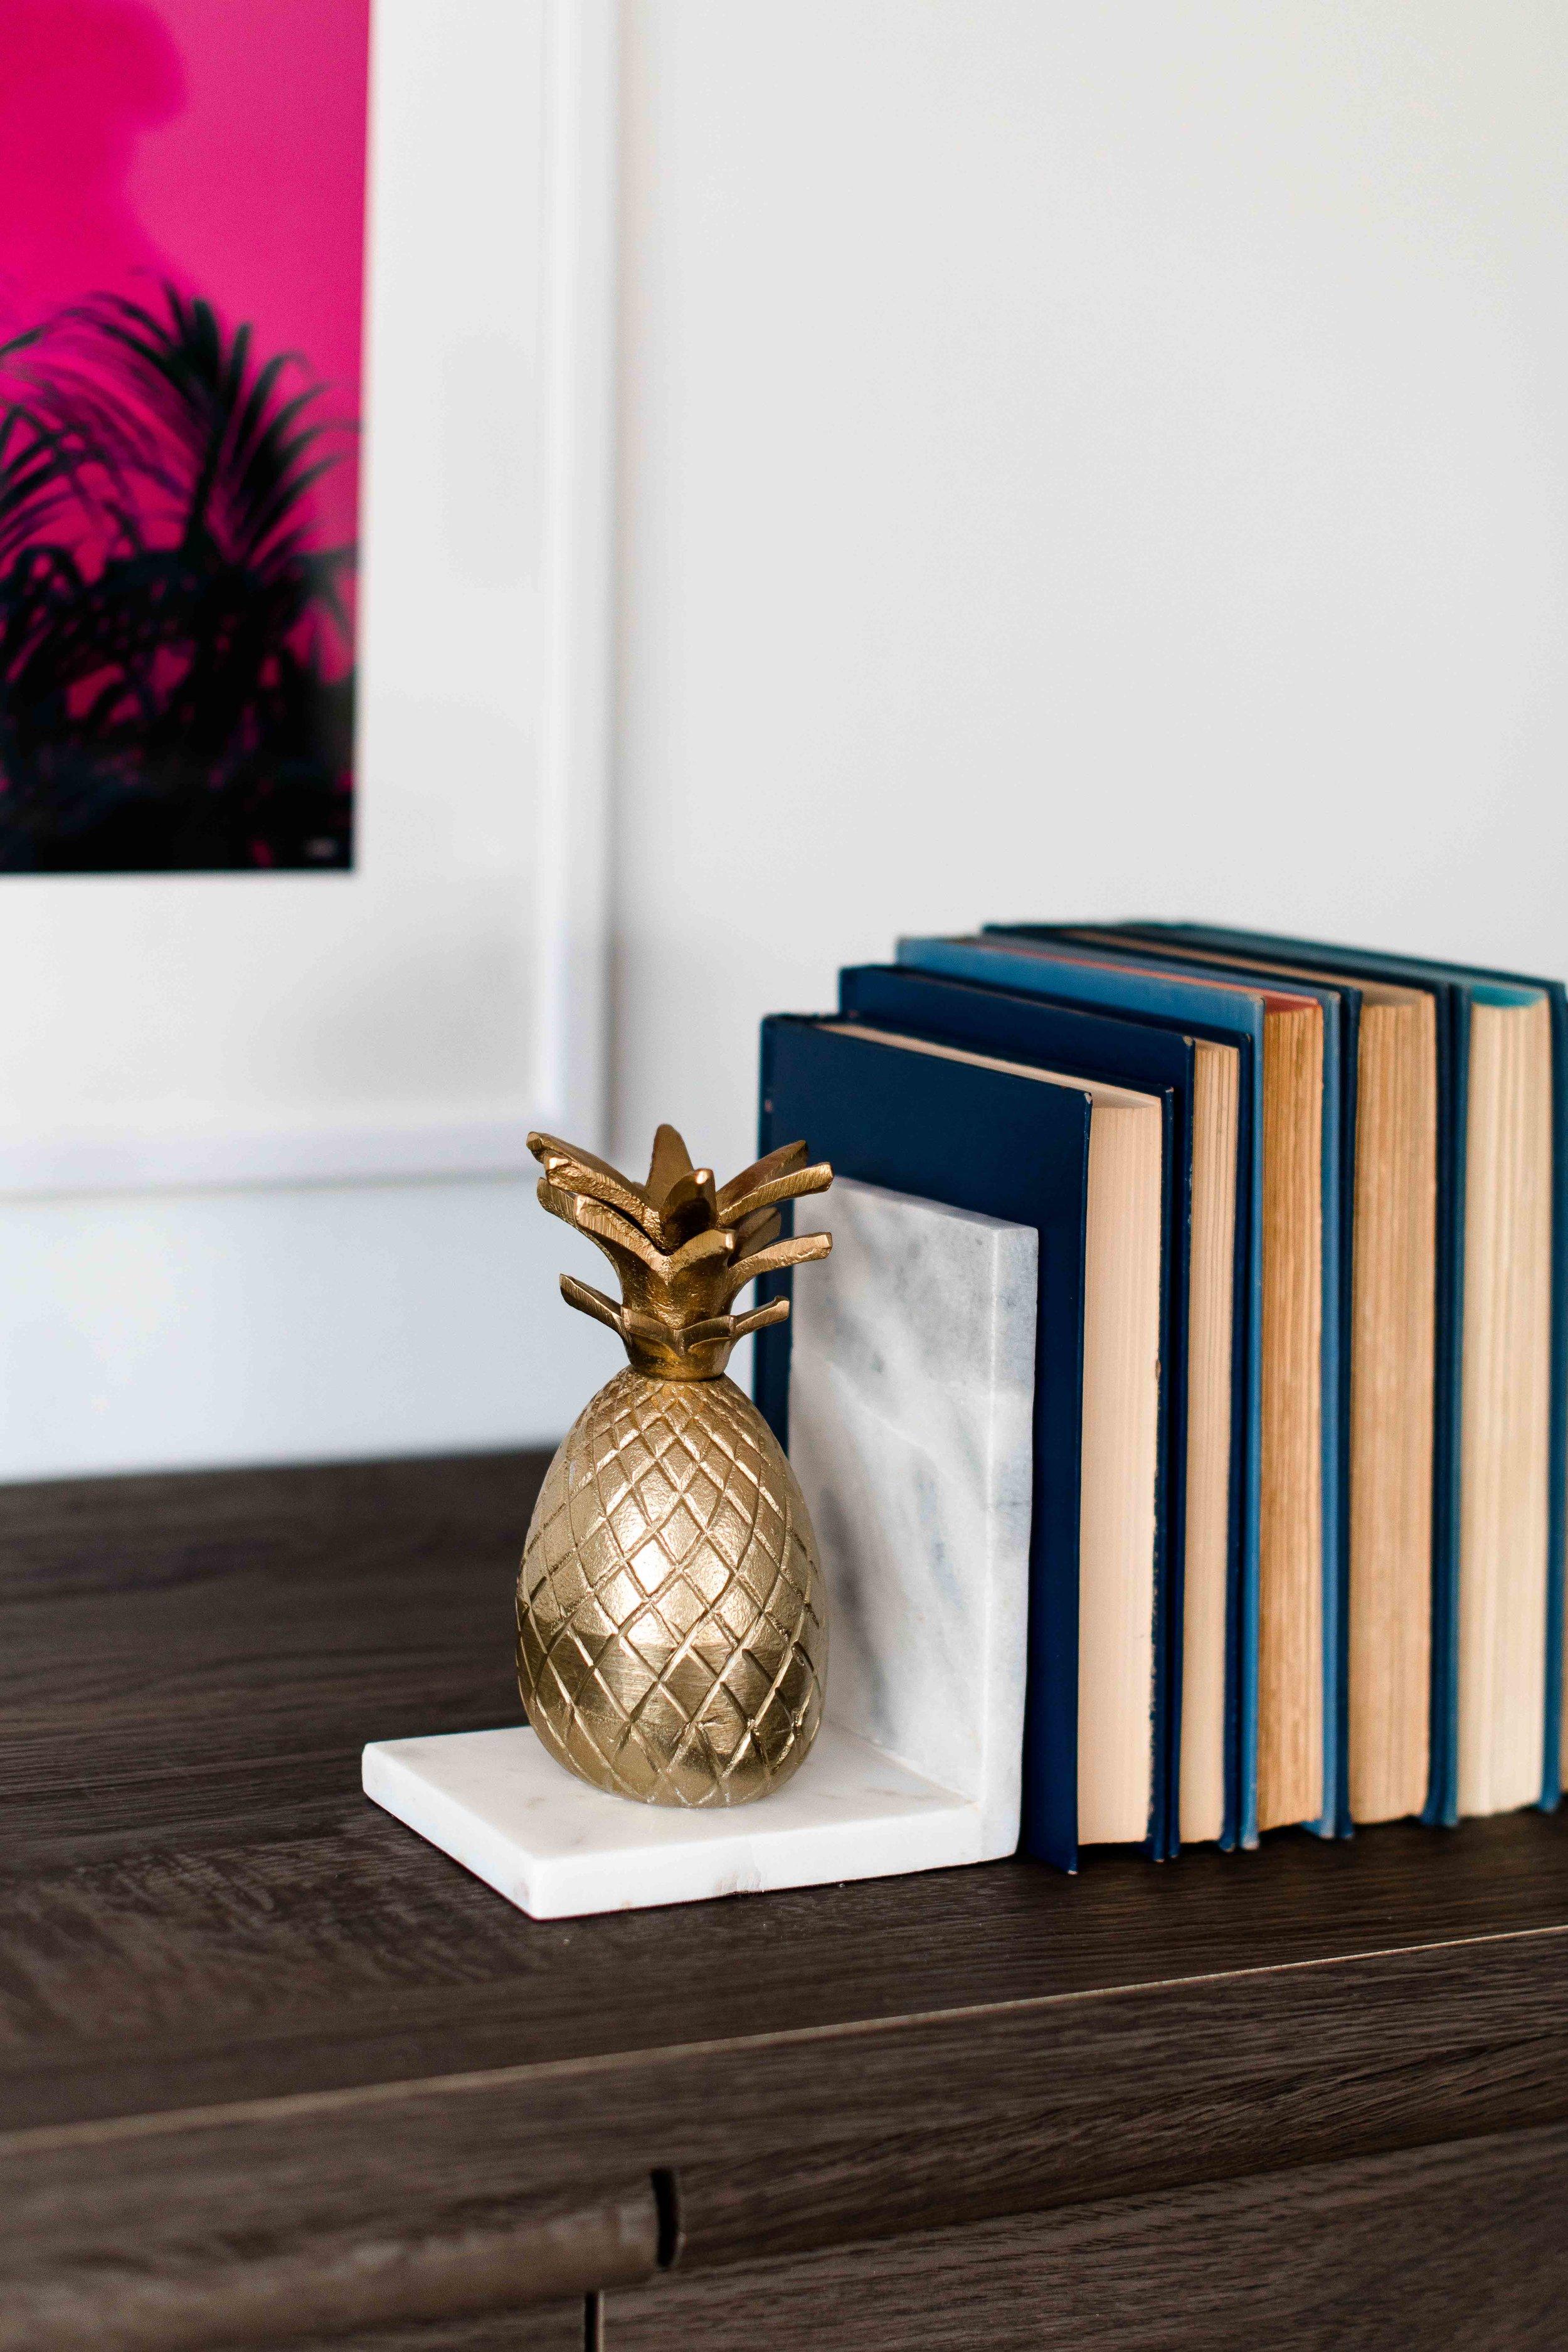 Sonder Stays Miami Interior Design Photographer Lifestyle Home Interiors Photography-31.jpg